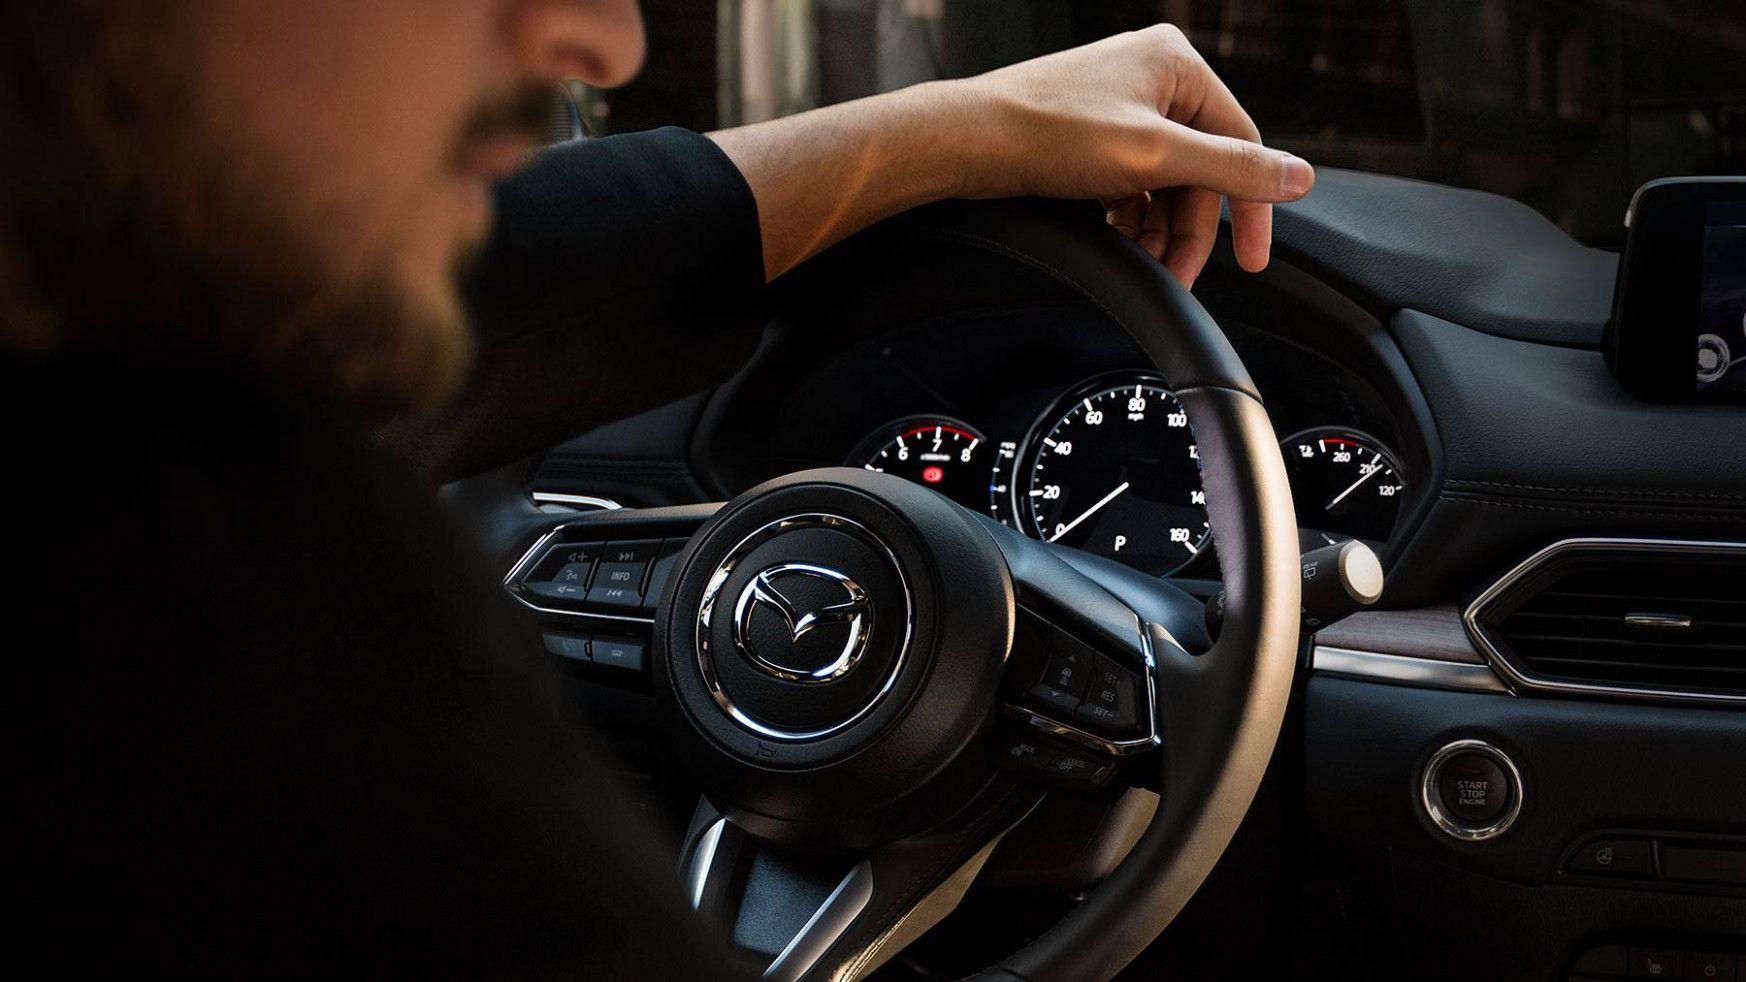 12 Mazda Cx 12 Tfl Expert Buyer S Guide Should I Really Spend 2019 Mazda Cx 5 Touring Vs Gran Mazda Touring Best Gas Mileage